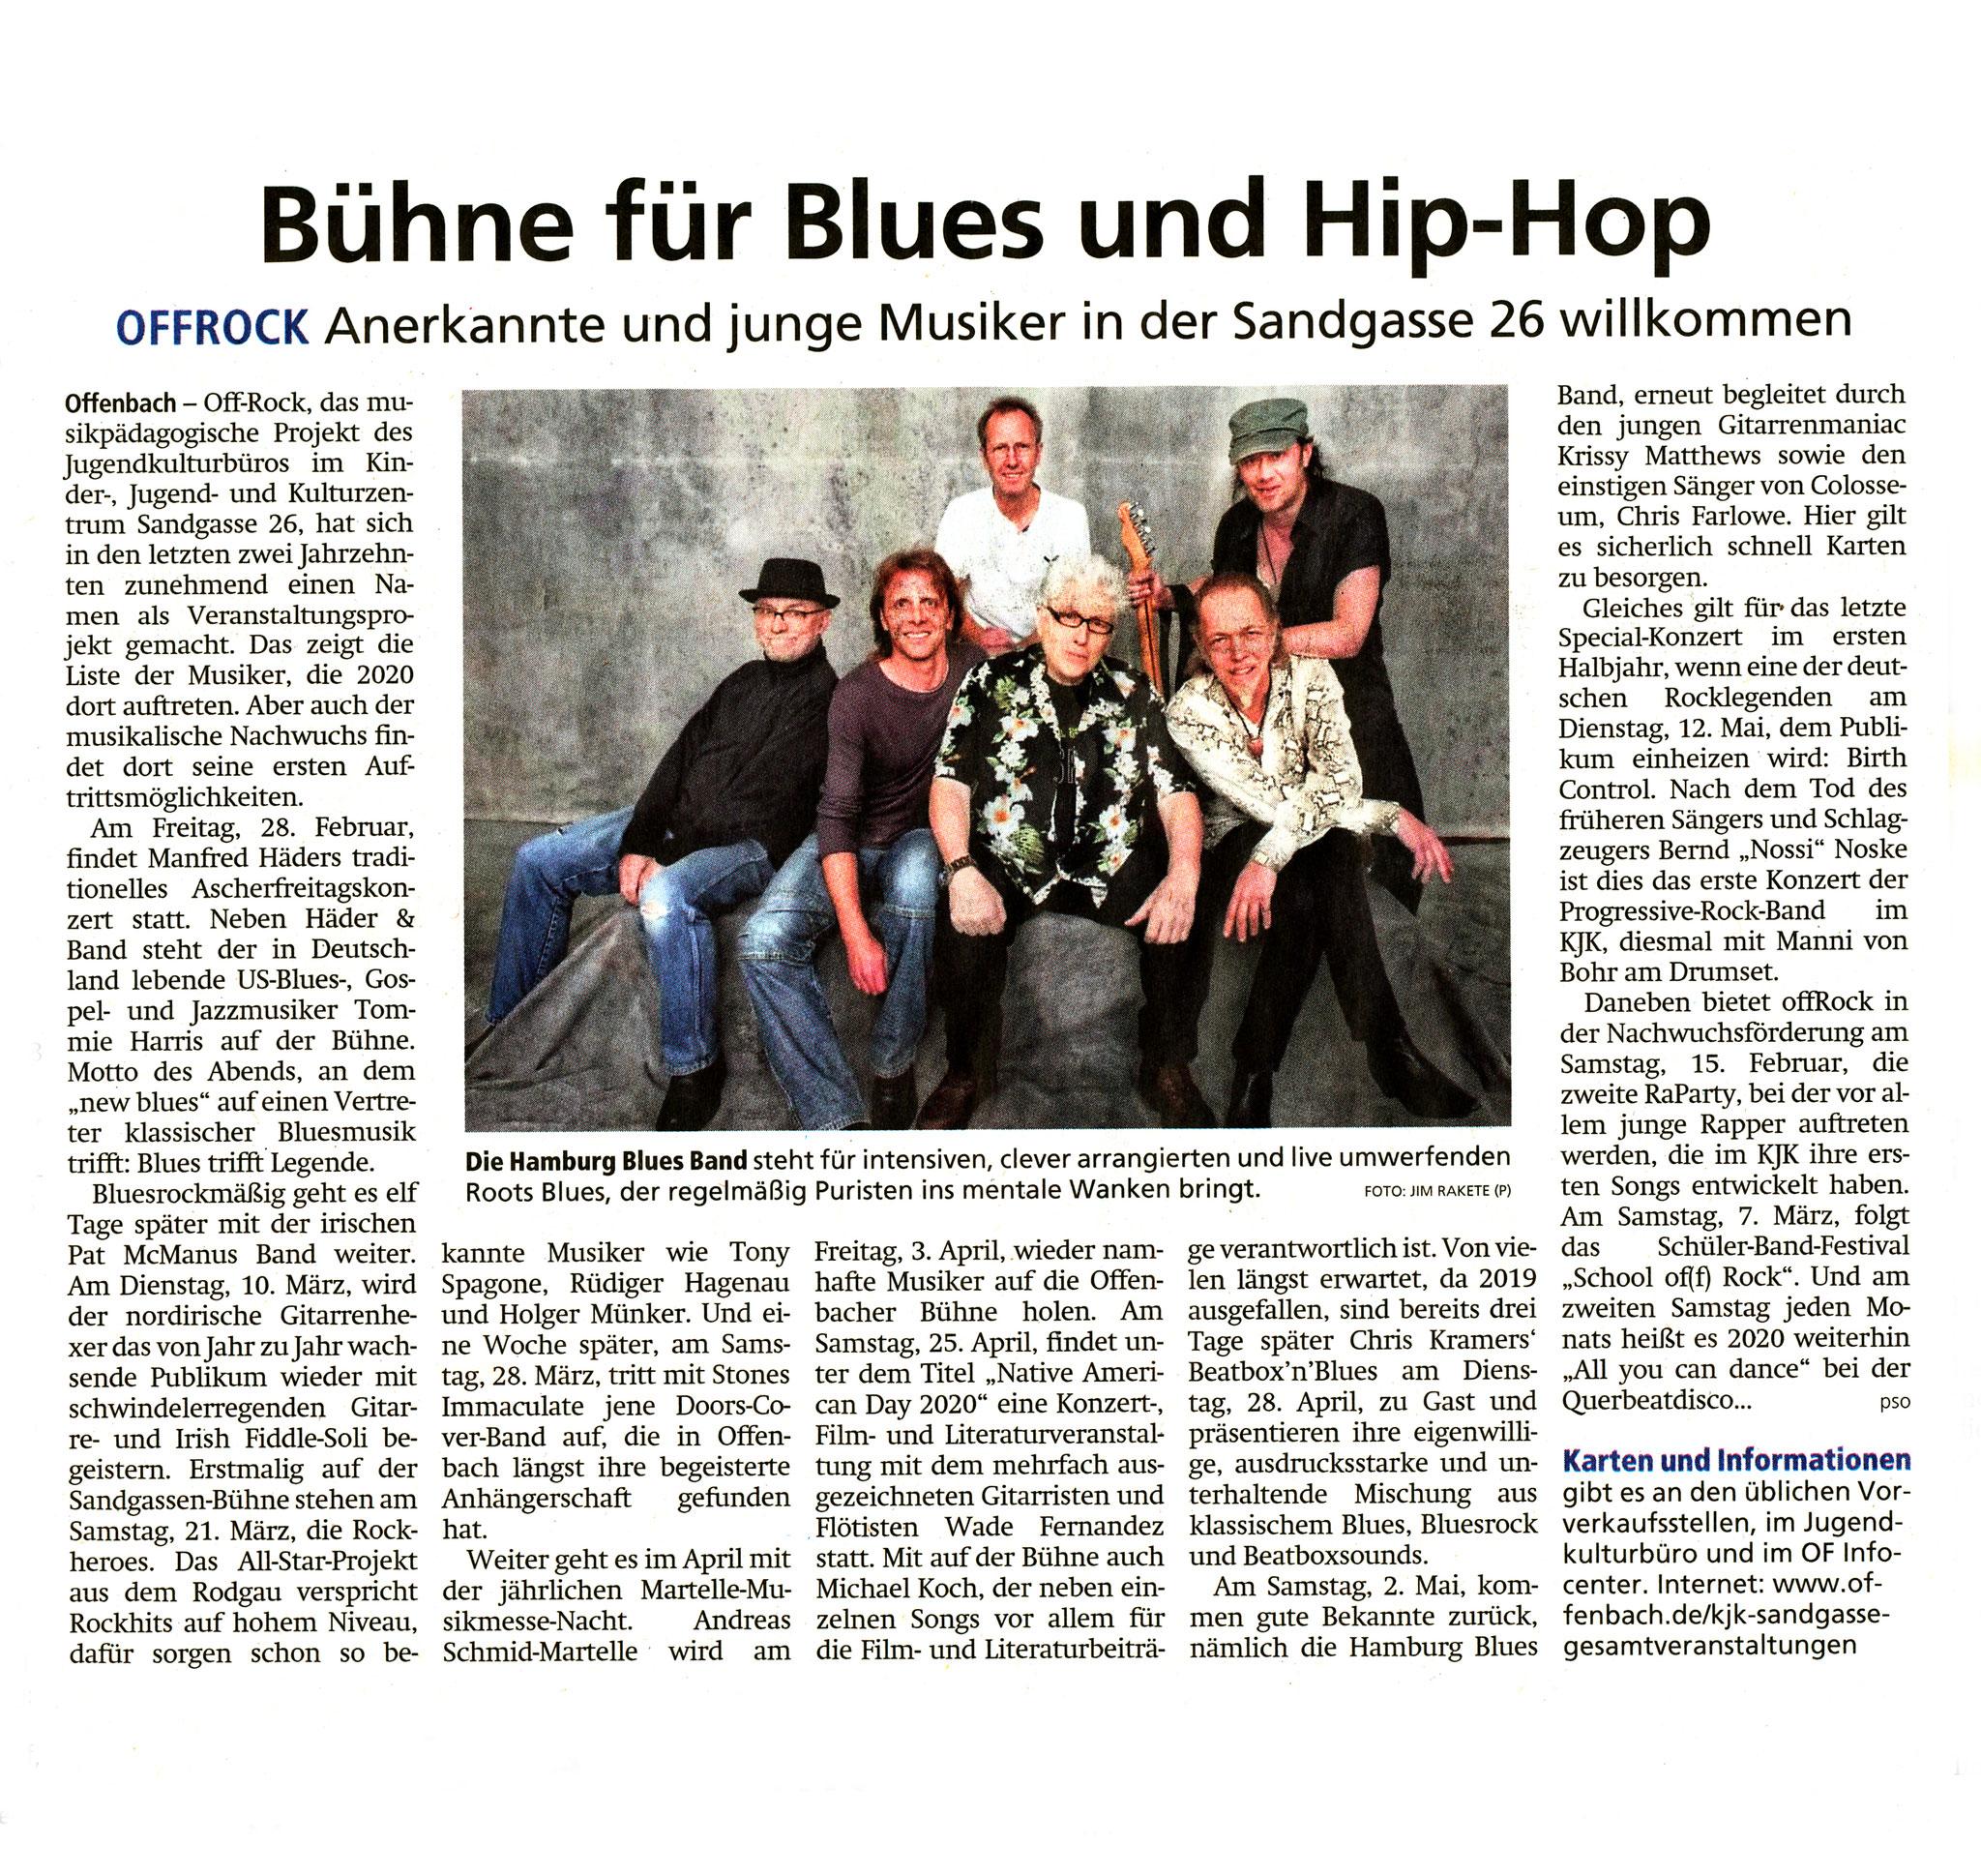 Offenbach Post, 29. Januar 2020